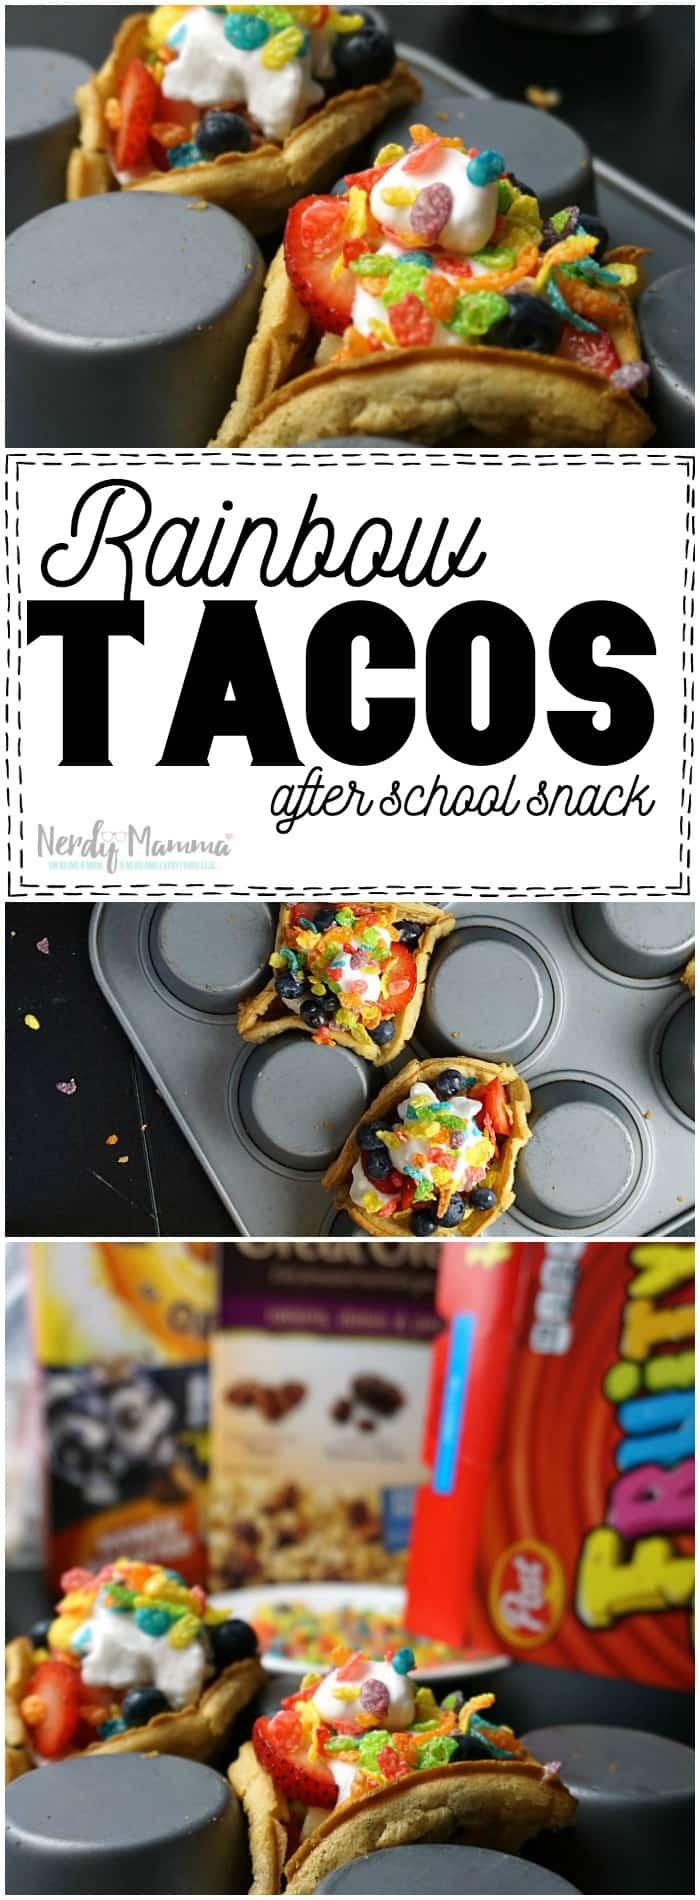 Easy rainbow tacos after school snack gf v nerdy mamma for Easy after school snacks for kids to make